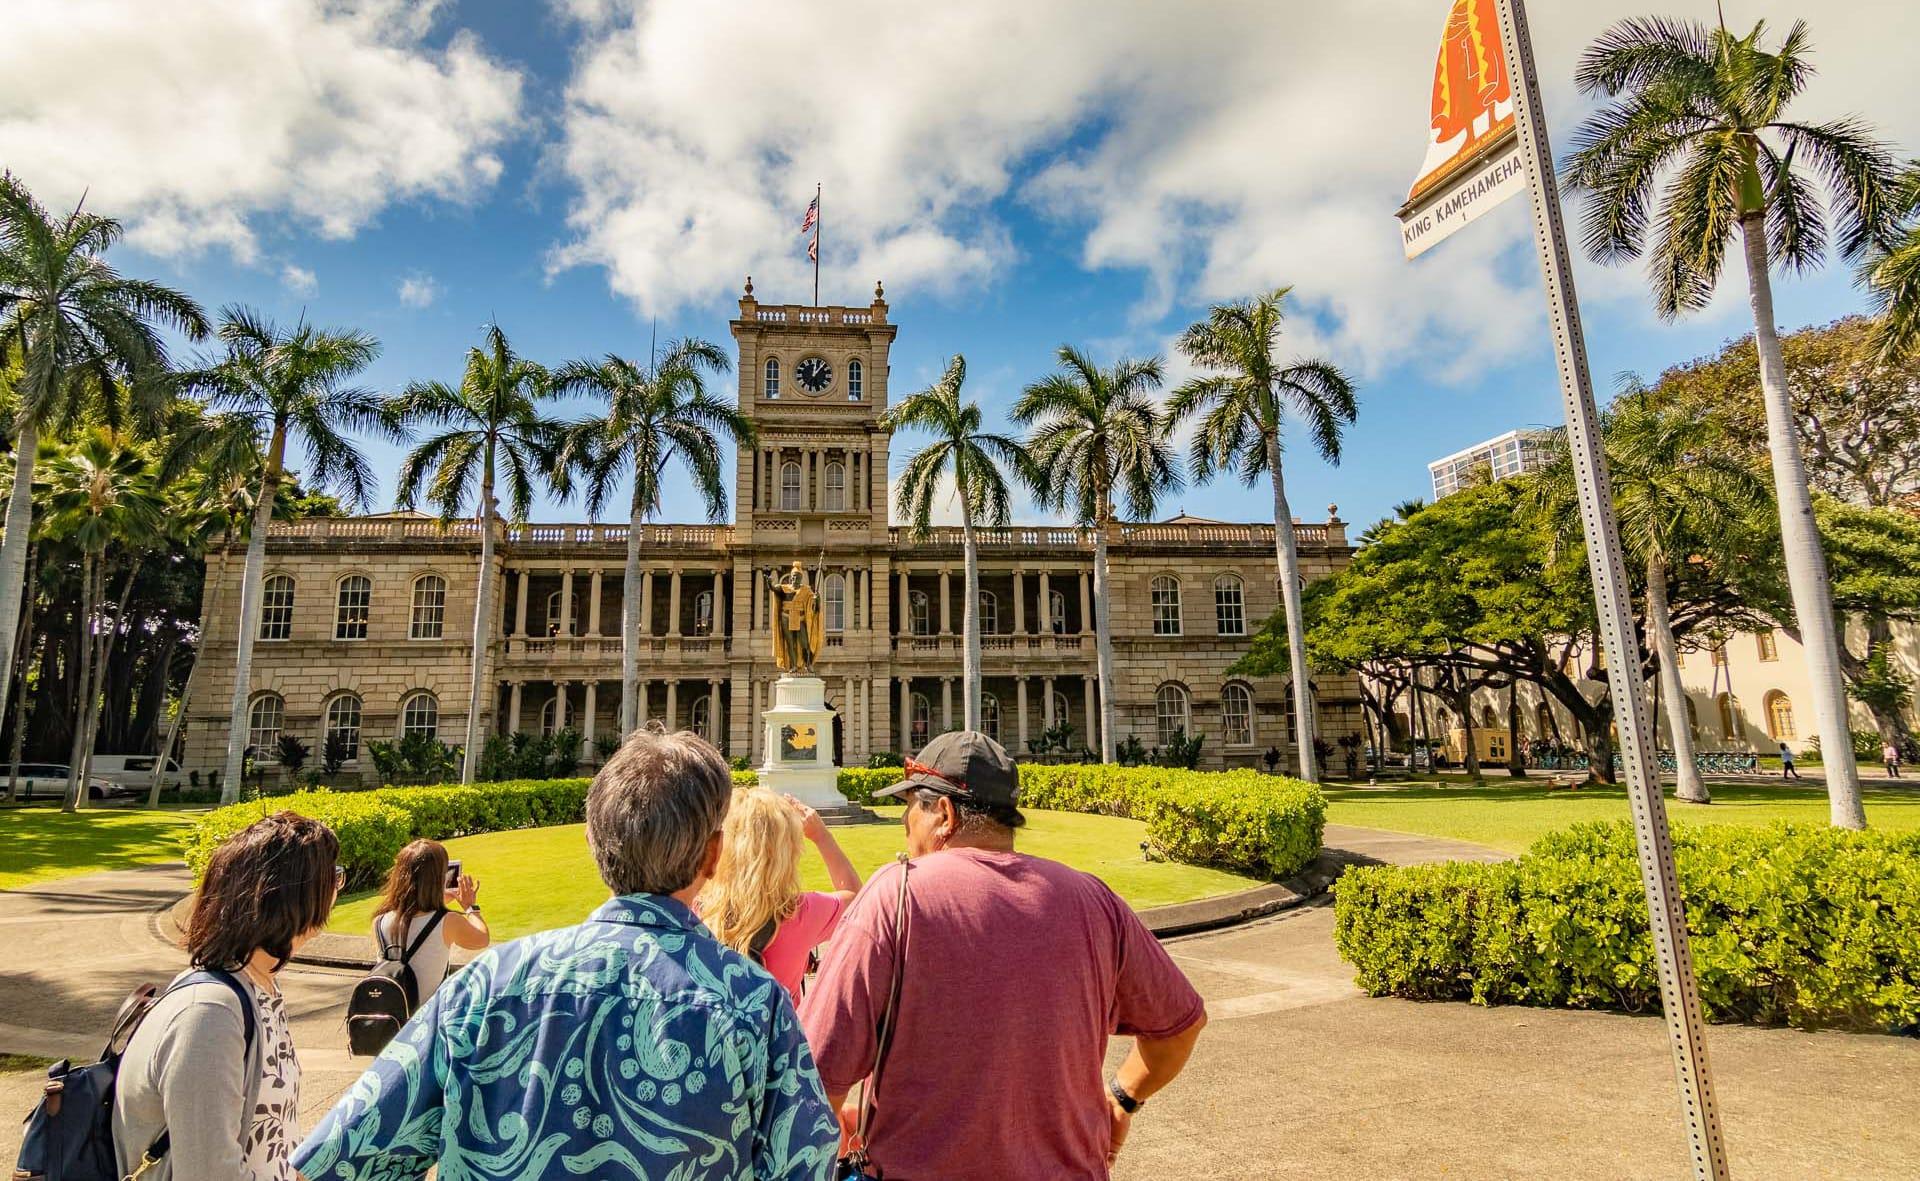 Aliiolani Hale and Kamehameha Statue Visitors and Sign Honolulu